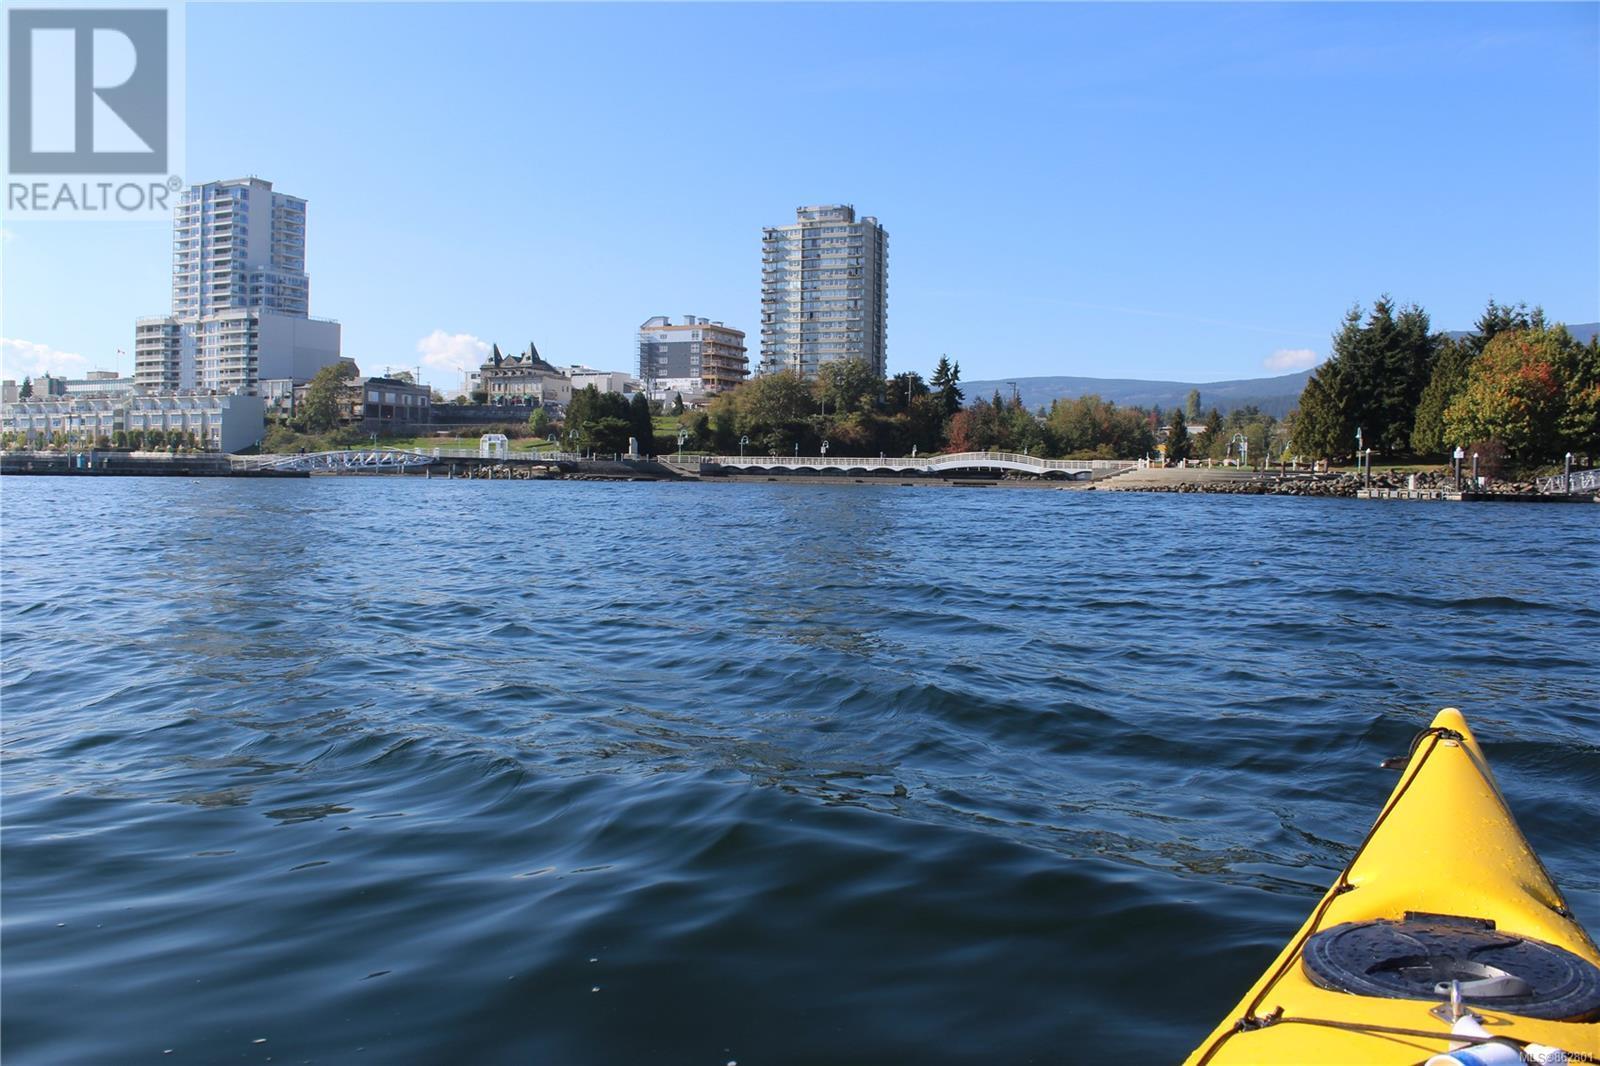 203 150 Promenade Dr, Nanaimo, British Columbia  V9R 6M6 - Photo 27 - 862801